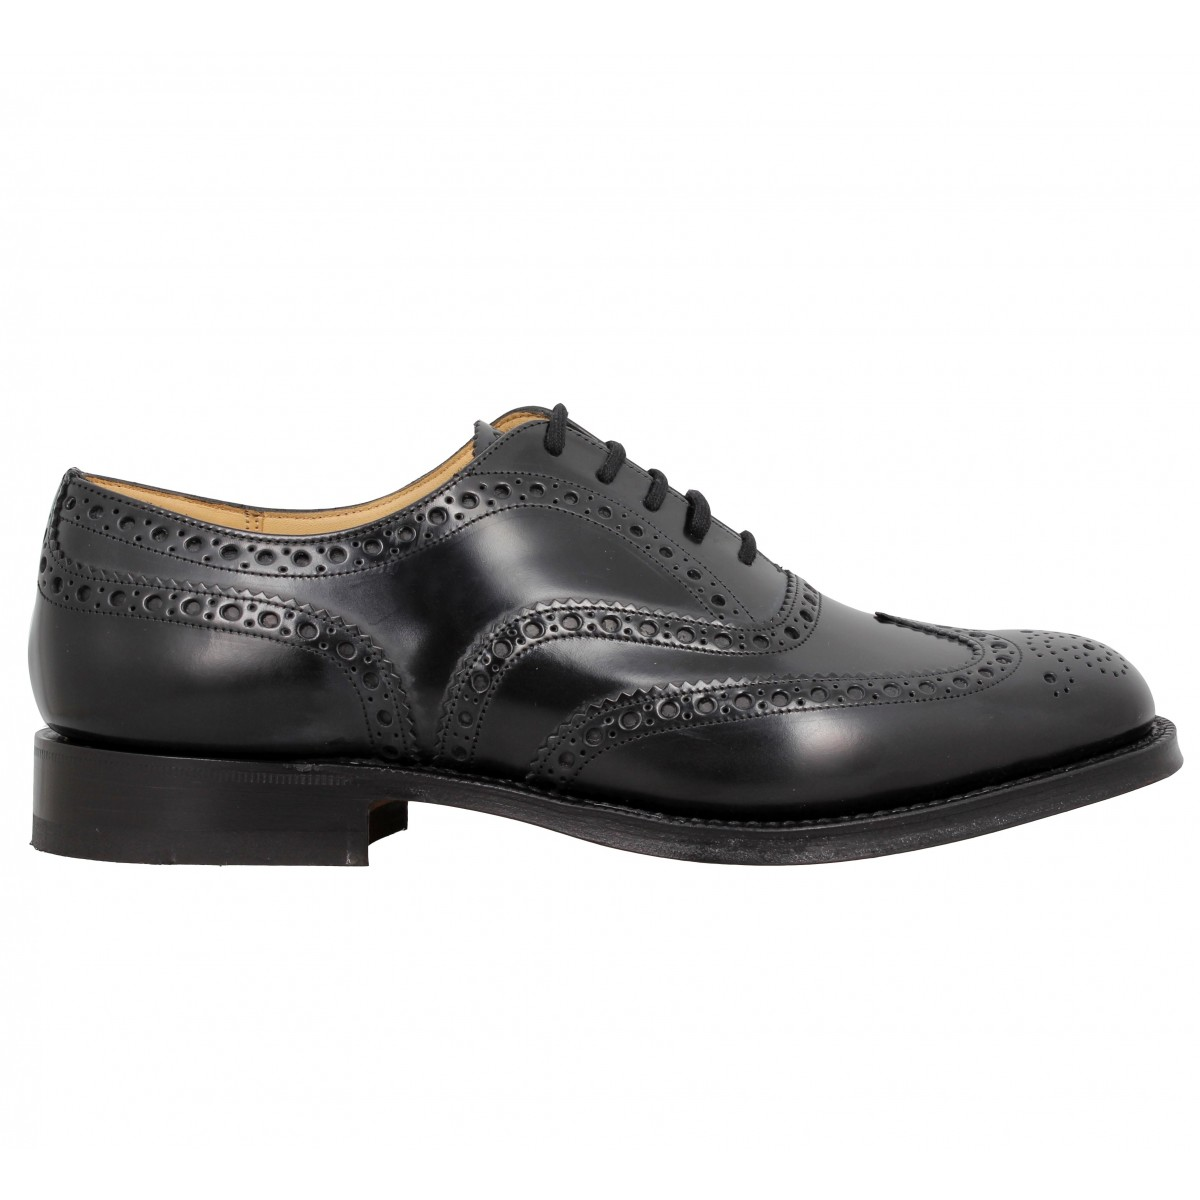 Chaussures à lacets CHURCHS Burwood cuir Homme NoirChurchs 9GdVK